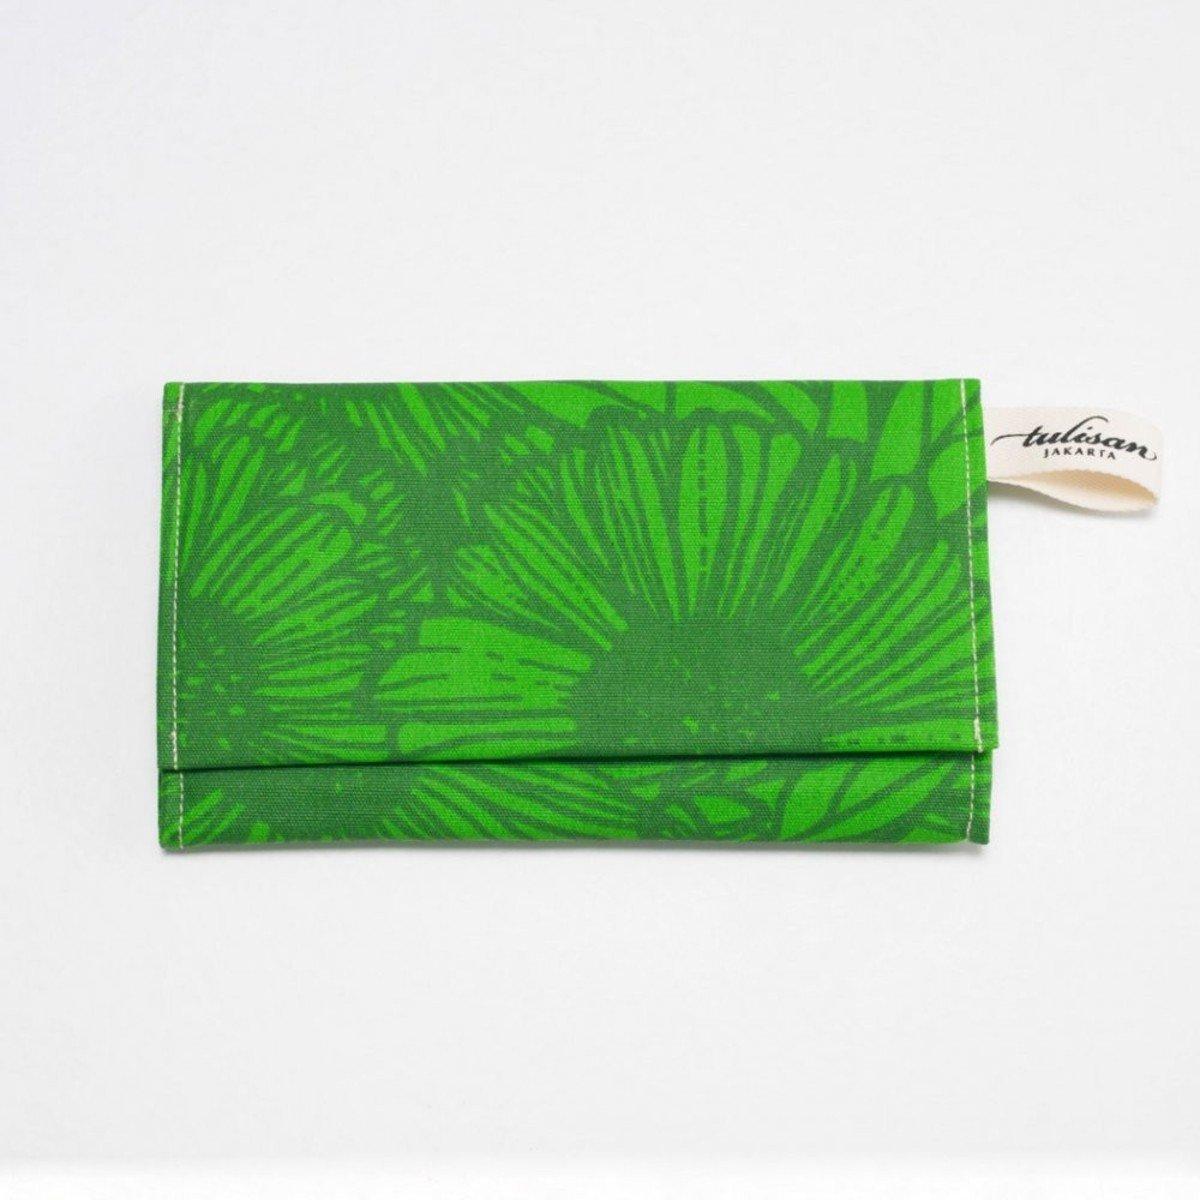 Olio Clutch 錢包 - Green Grass